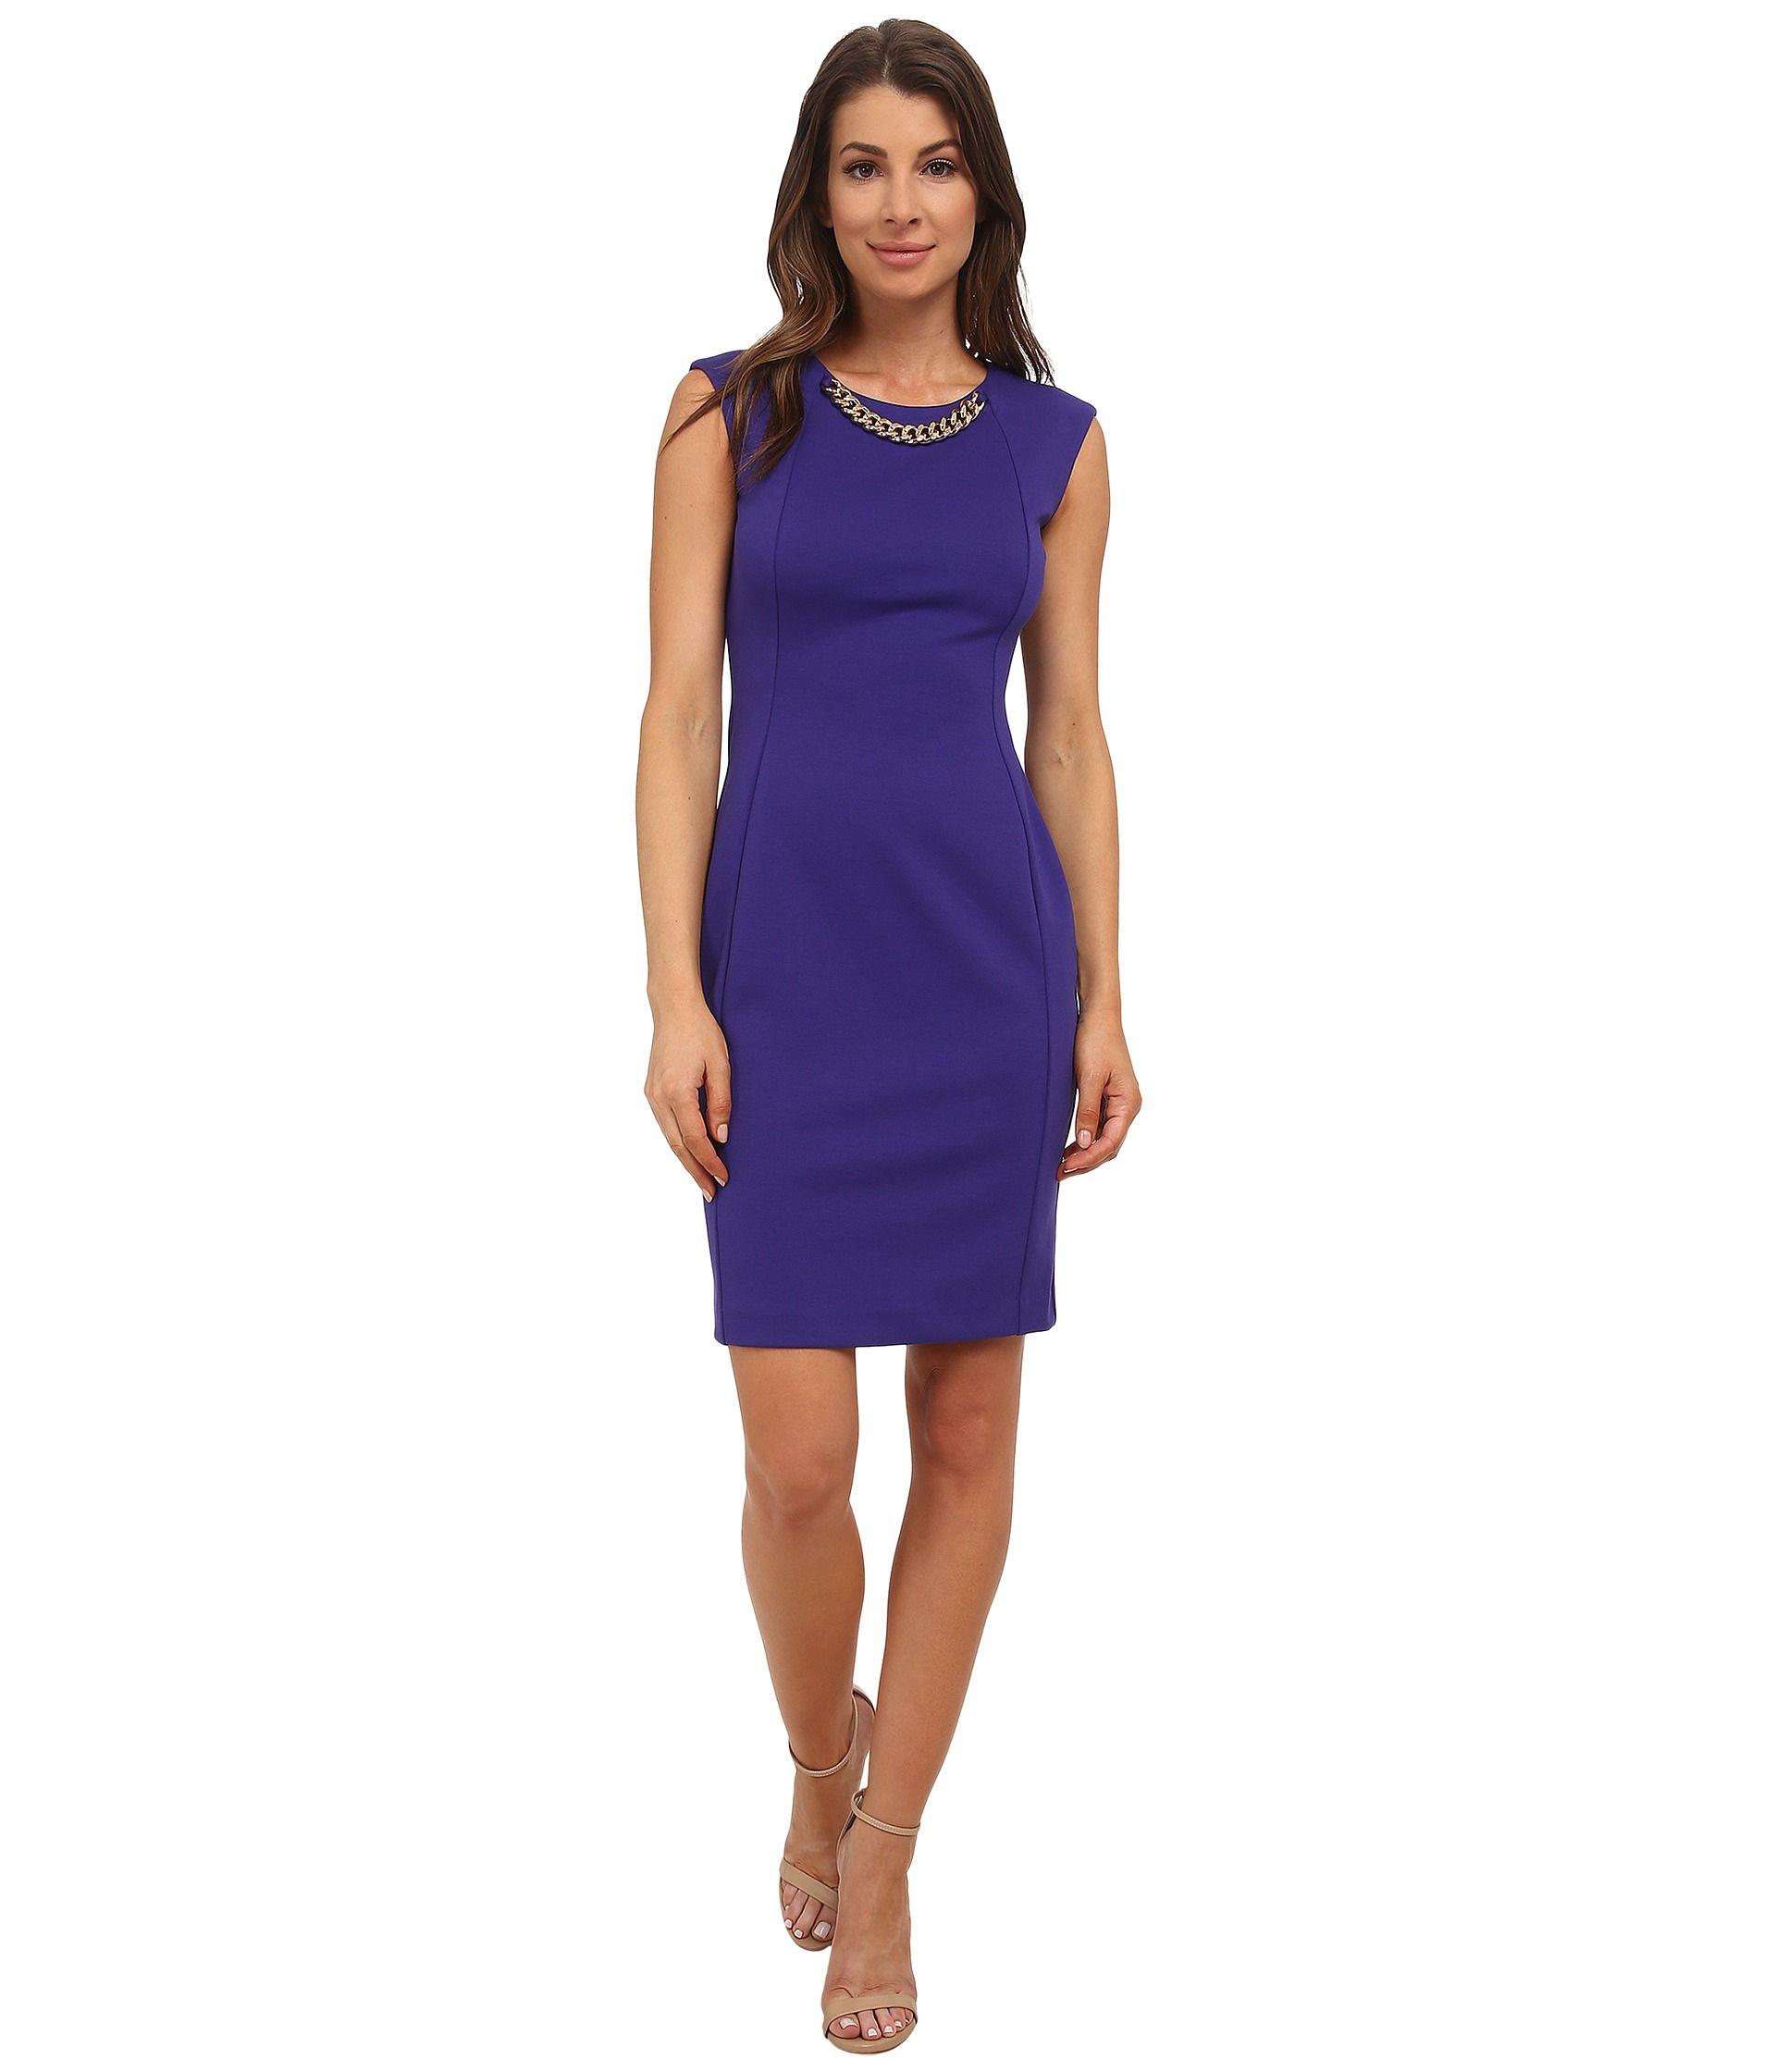 CALVIN KLEIN. Purple Chain-Link Ponte Sheath Dress. Taille 40. RCK ...